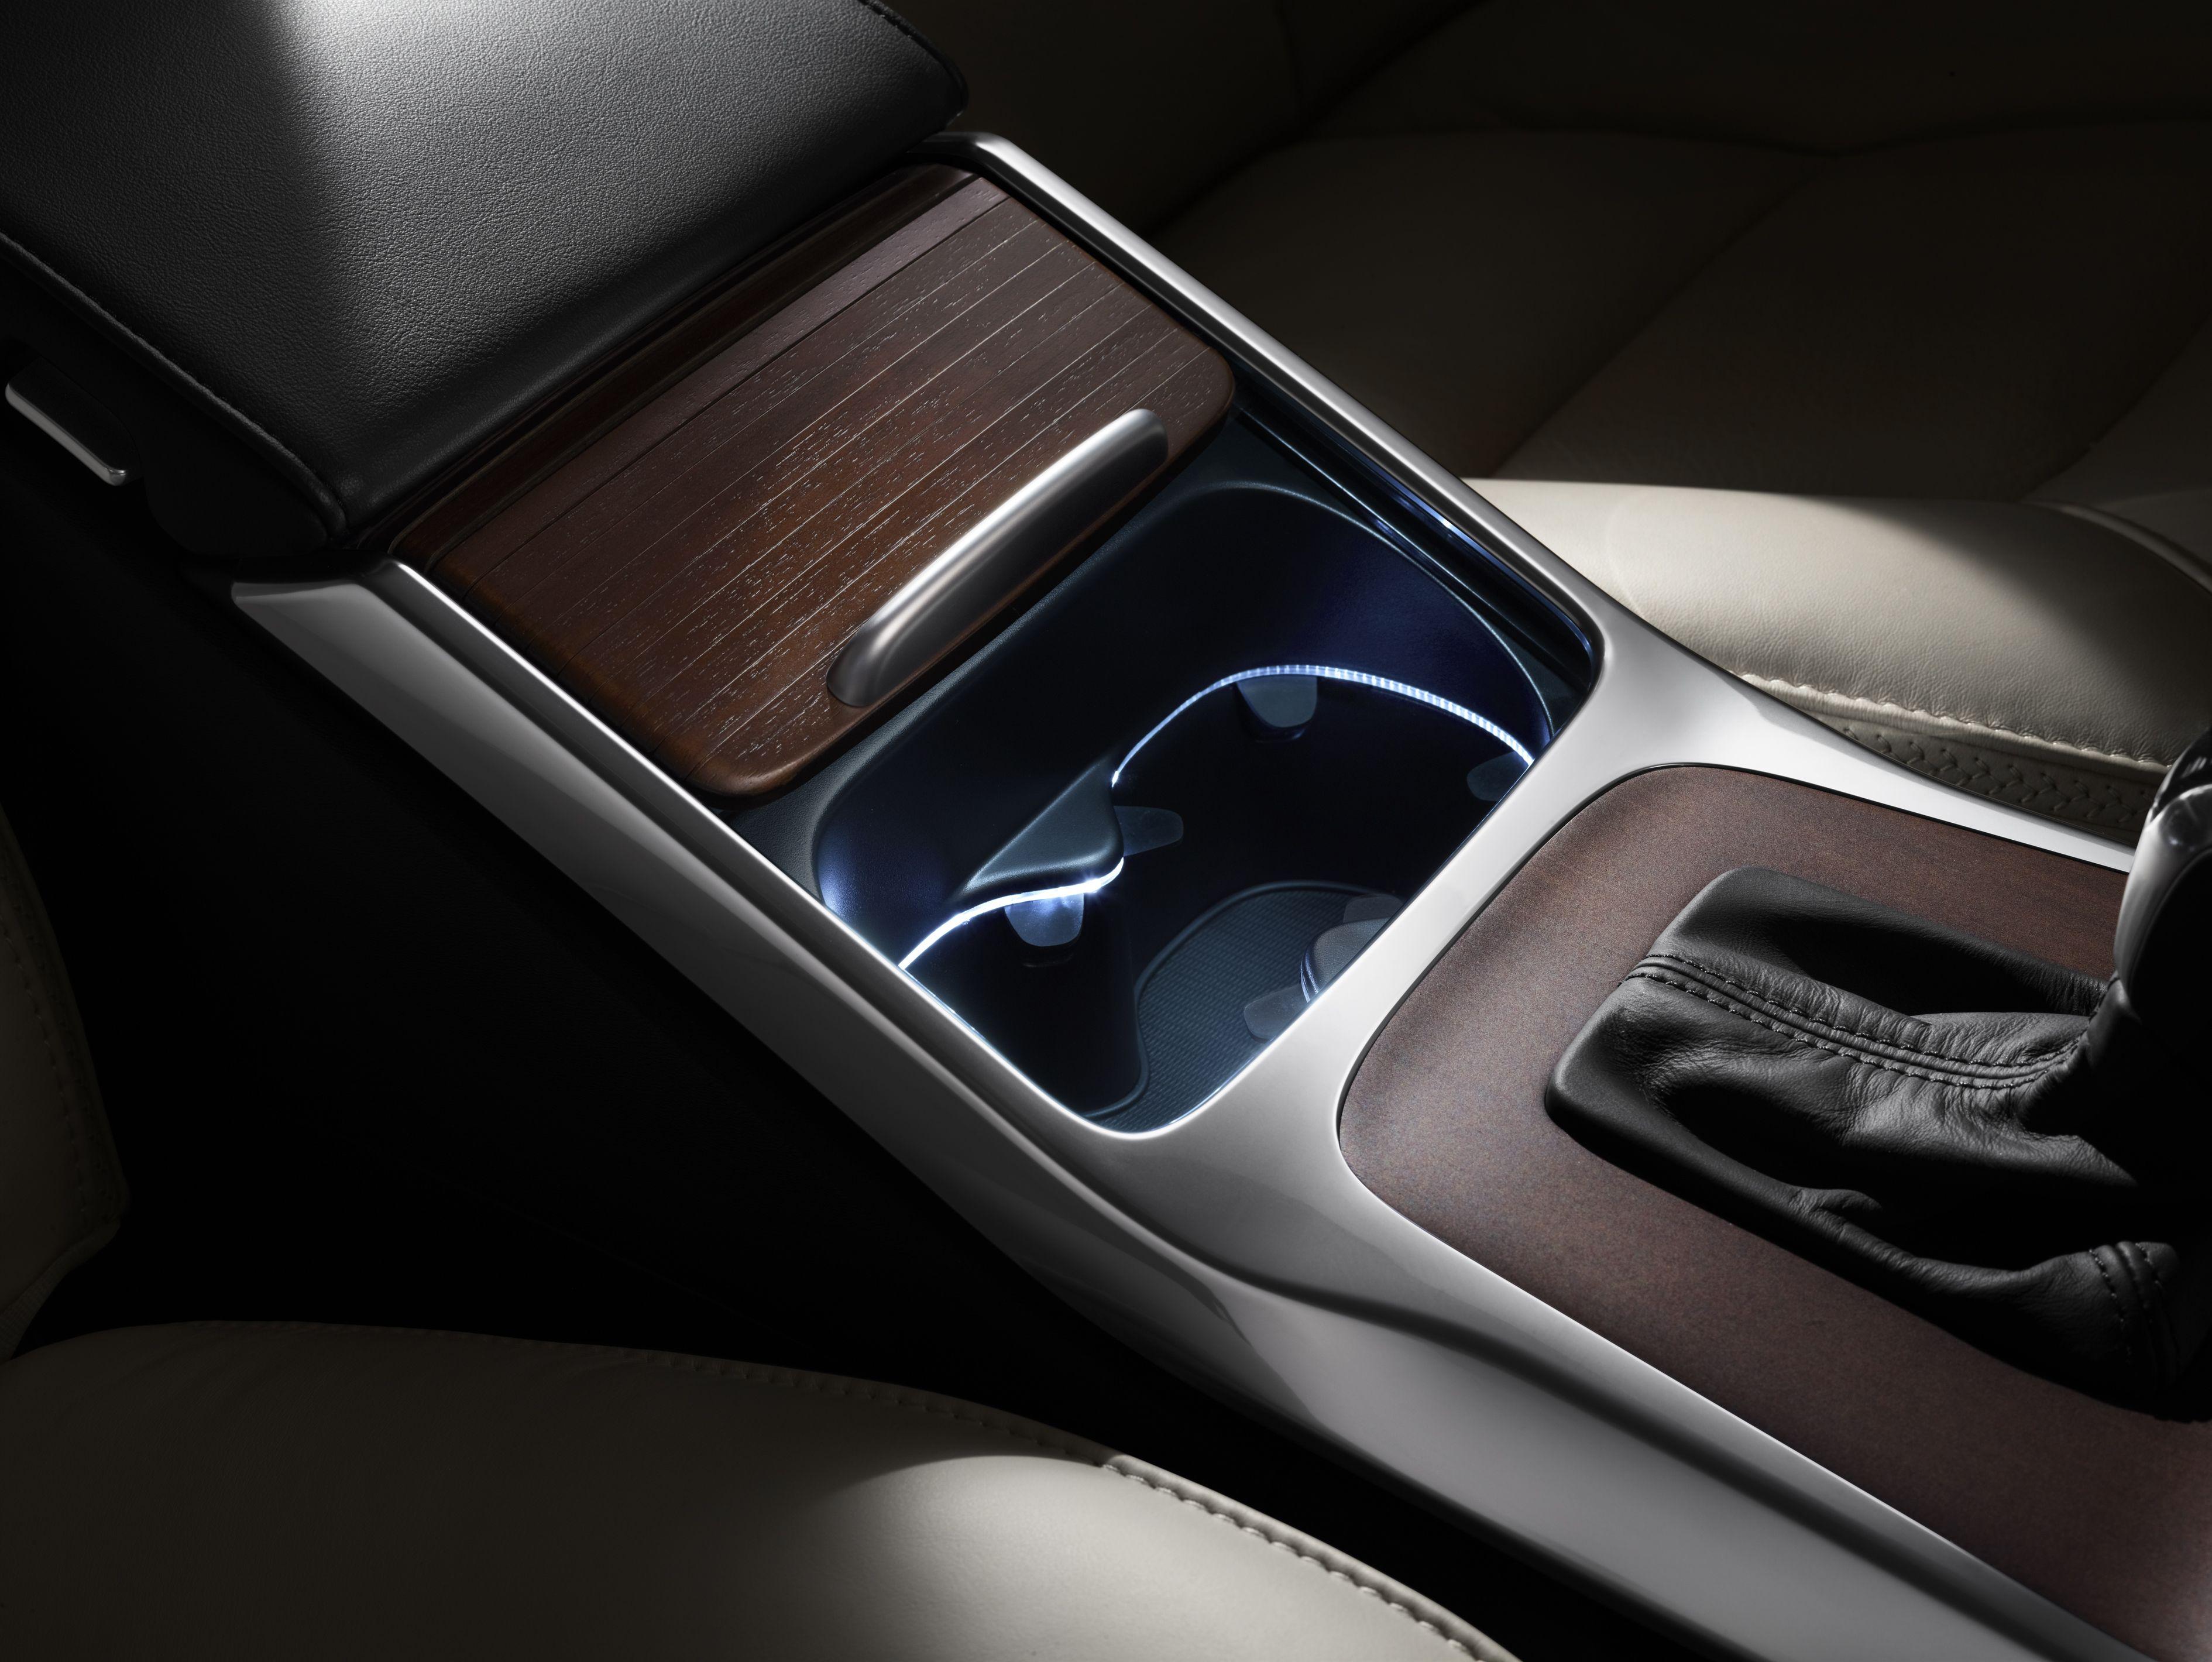 Volvo XC70 interieur | Design | Pinterest | Volvo and Volvo v70